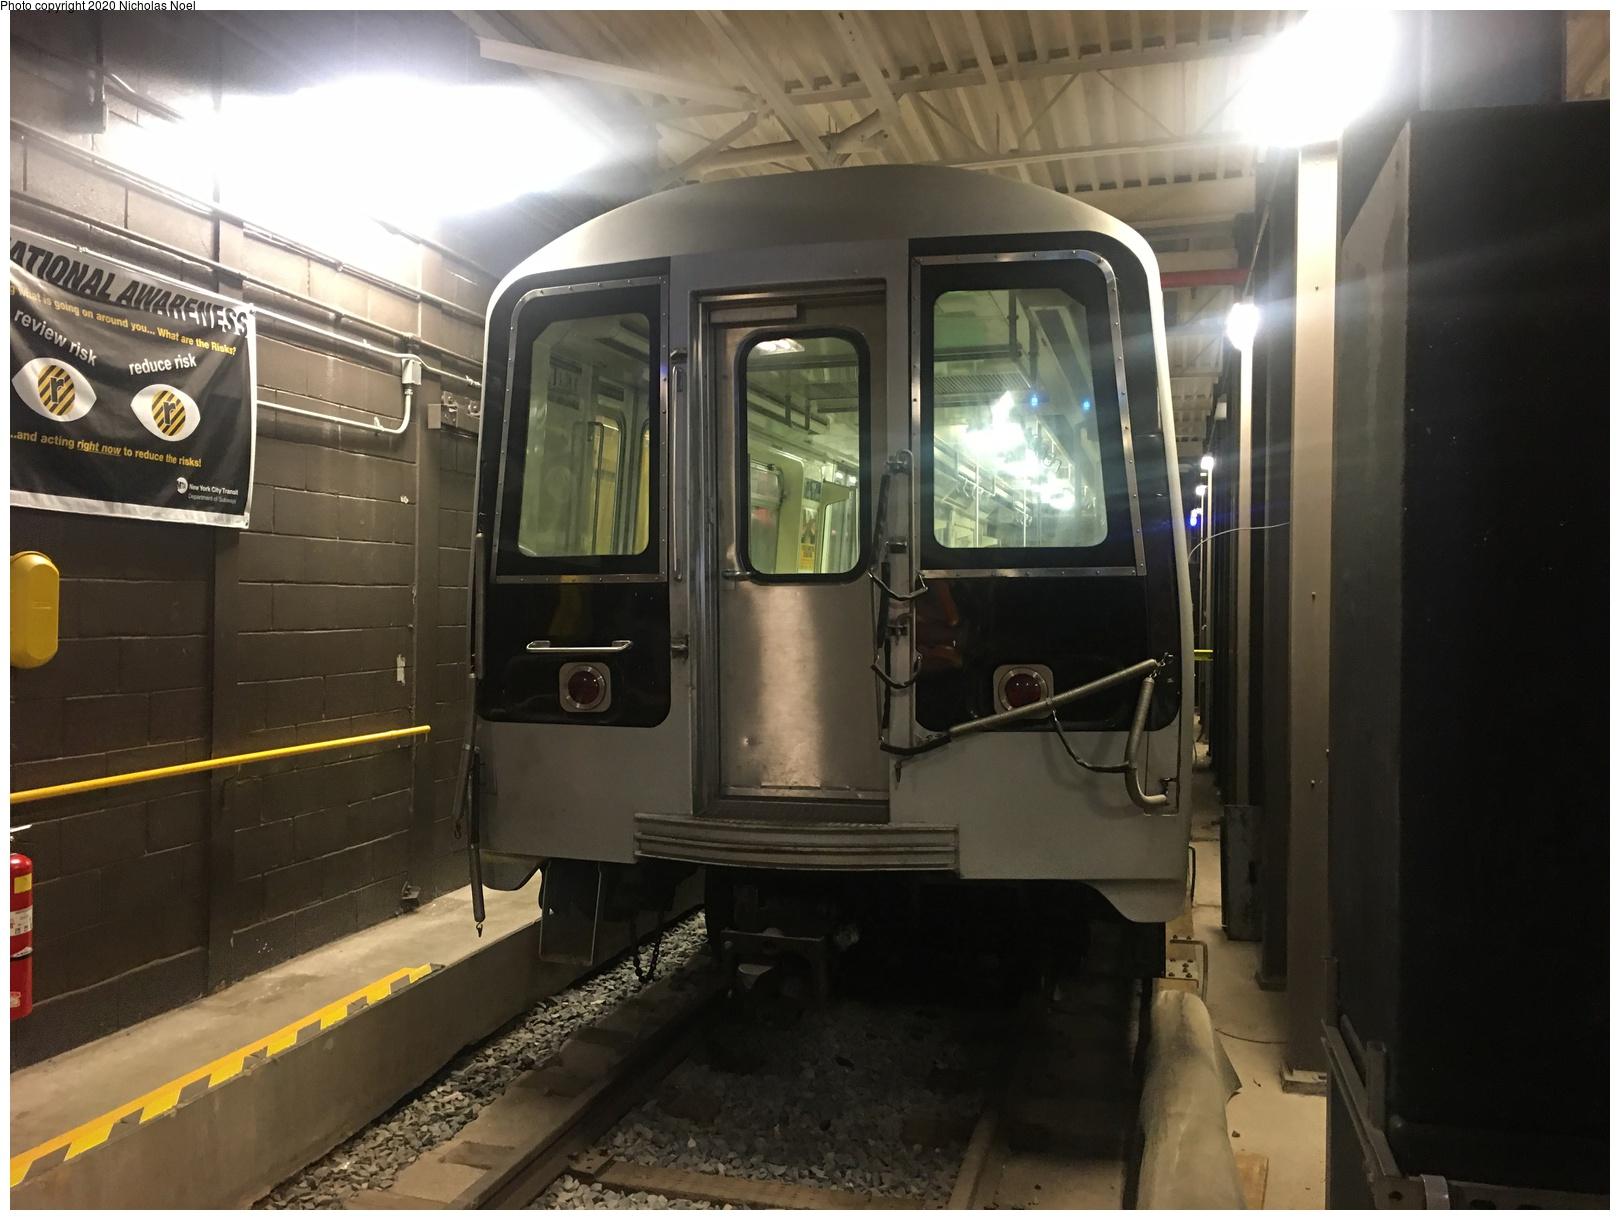 (527k, 1620x1220)<br><b>Country:</b> United States<br><b>City:</b> New York<br><b>System:</b> New York City Transit<br><b>Location:</b> Coney Island Yard-Training Facilities<br><b>Car:</b> R-110B (Bombardier, 1992) 3004 <br><b>Photo by:</b> Nicholas Noel<br><b>Date:</b> 10/17/2019<br><b>Viewed (this week/total):</b> 5 / 420